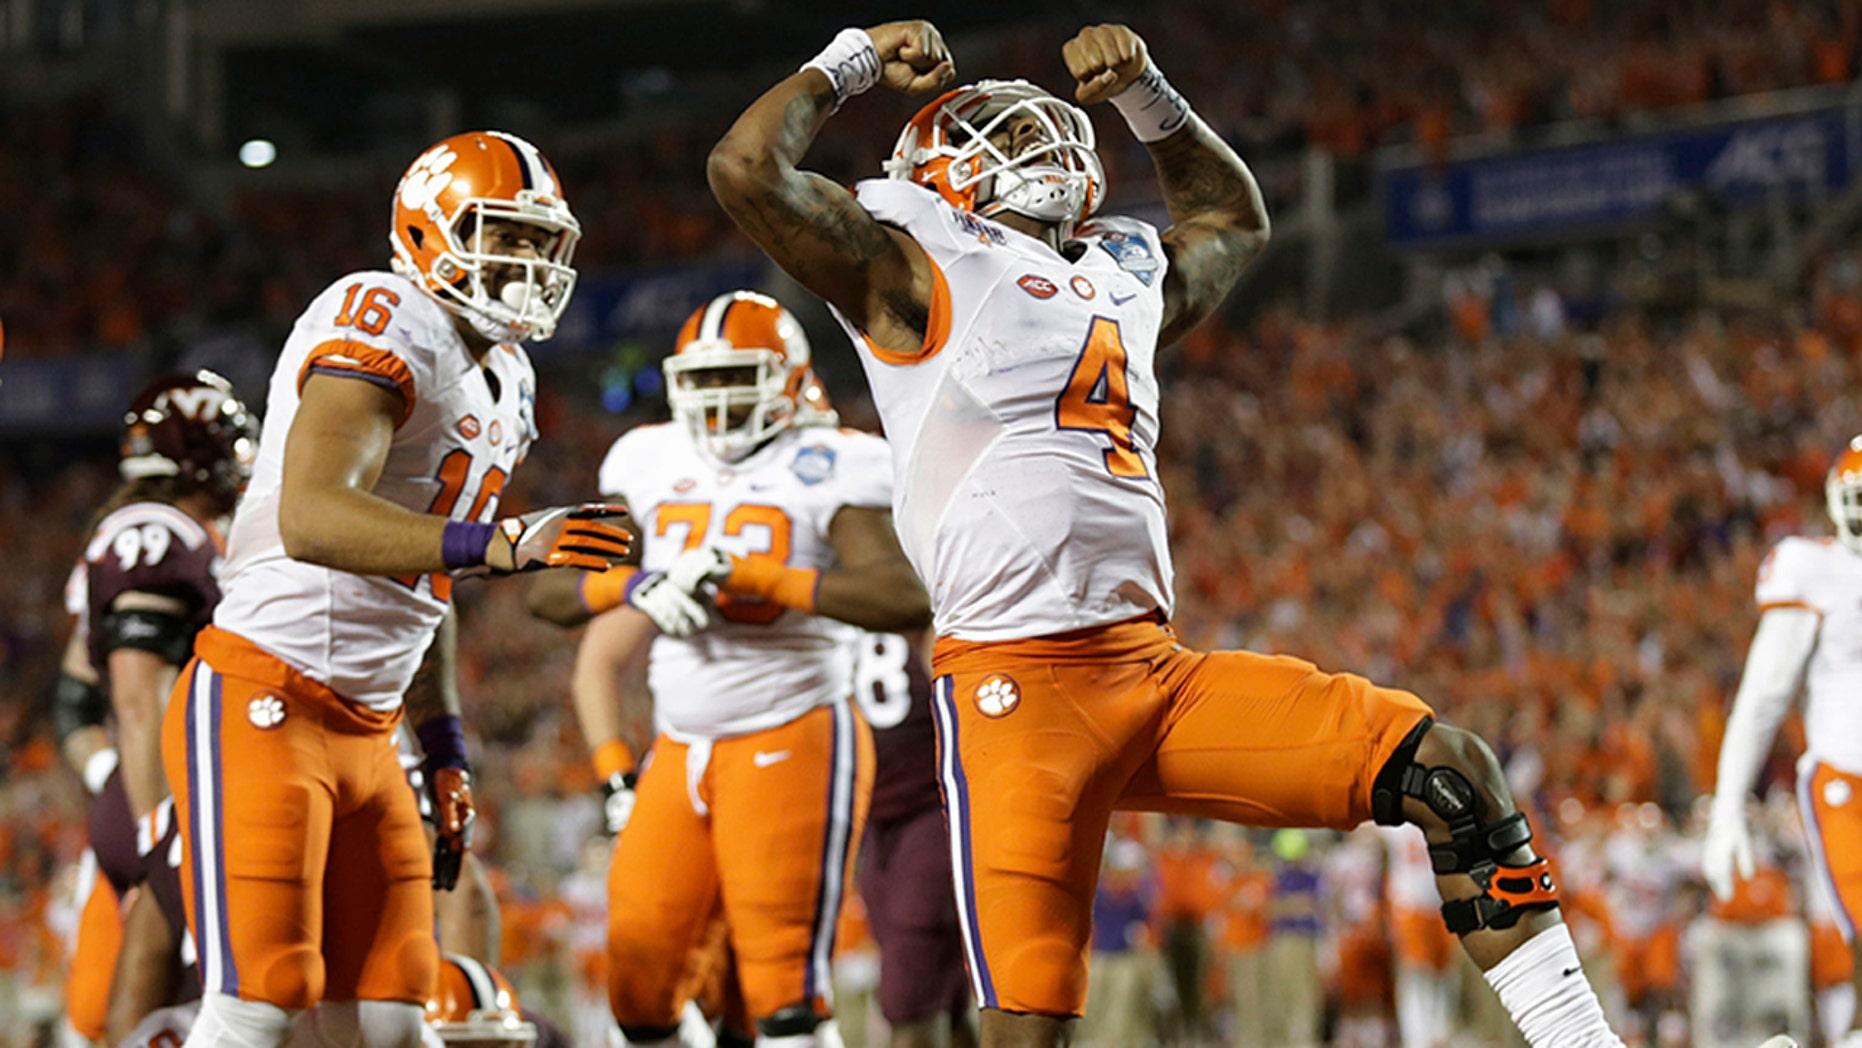 Dec. 3, 2016: Clemson quarterback Deshaun Watson (4) celebrates his touchdown during the second half of the ACC championship game against Virginia Tech in Orlando, Fla.